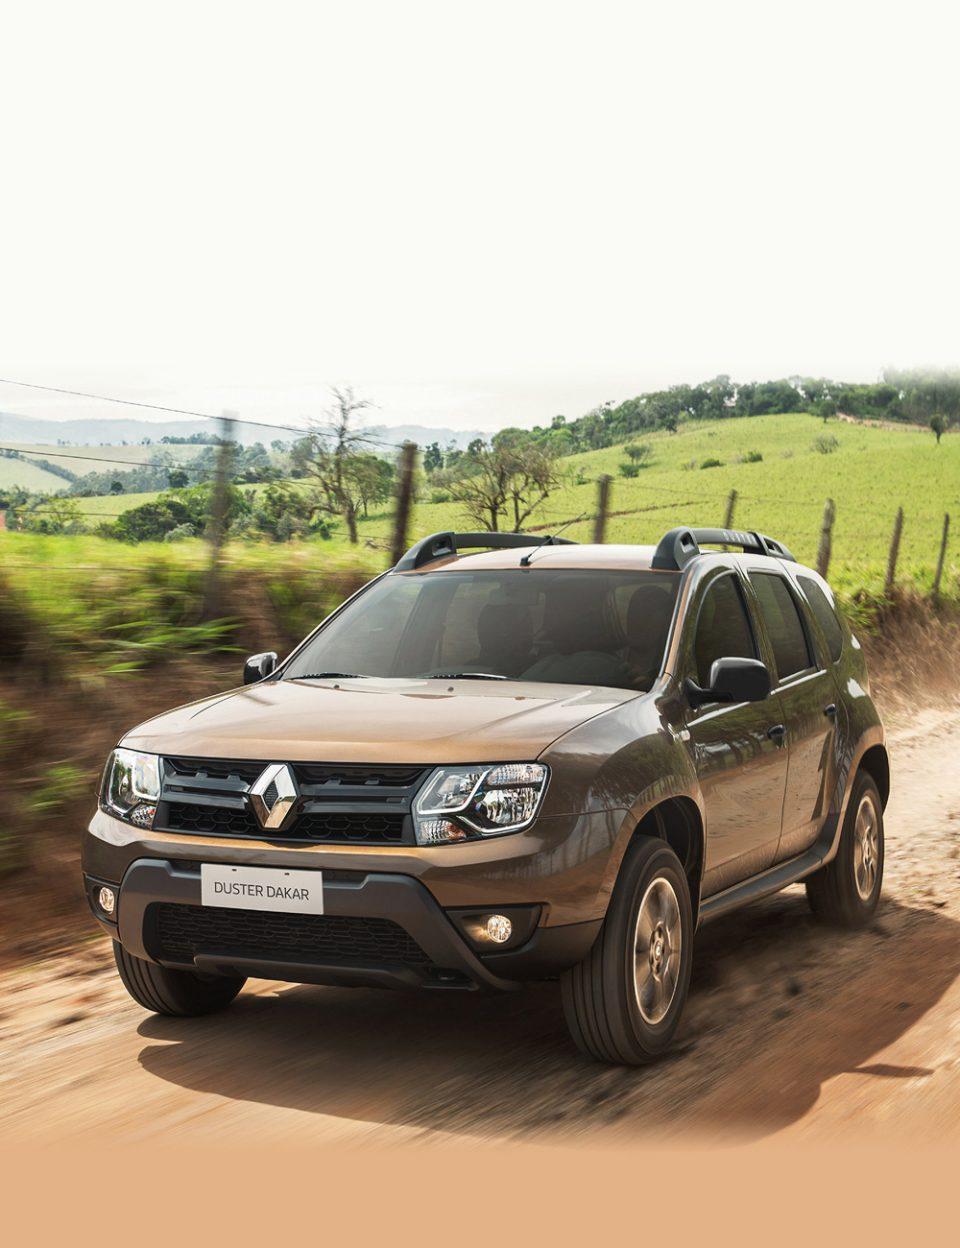 DUSTER Dakar Serie Limitada